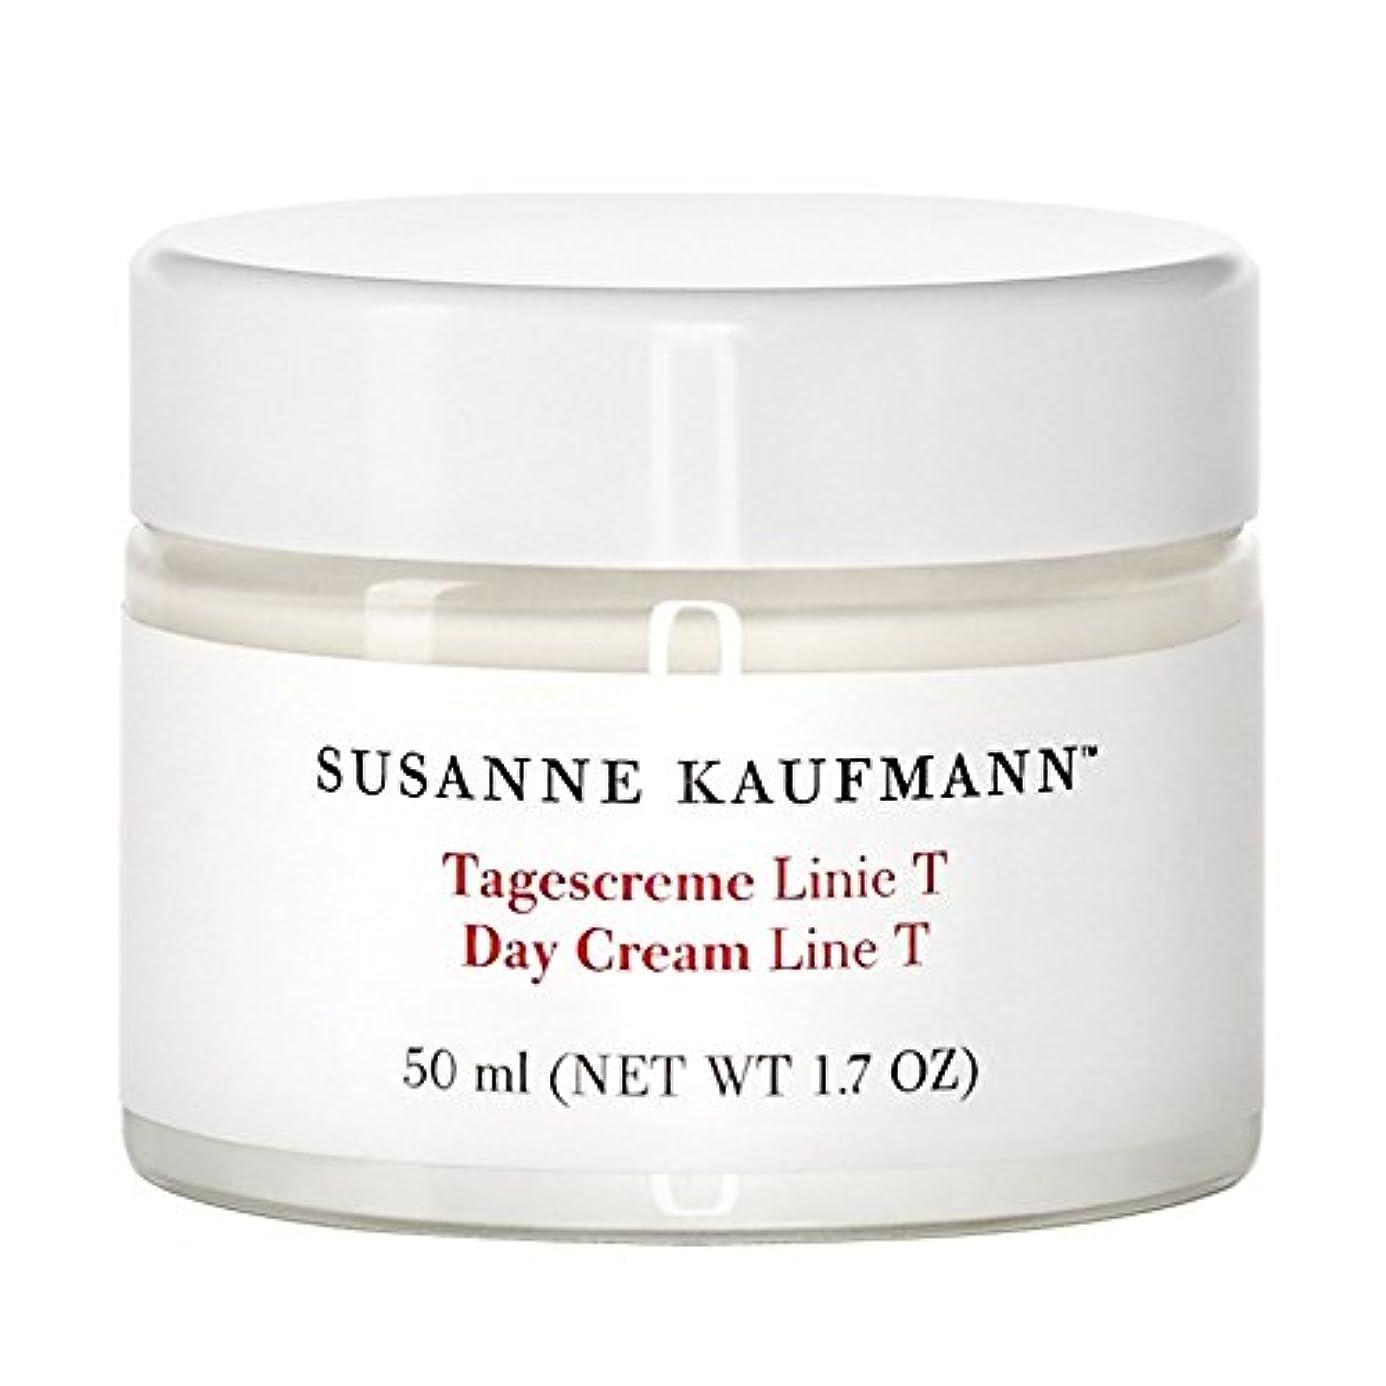 Susanne Kaufmann Day Cream Line T 50ml - スザンヌカウフマン日クリームライントンの50ミリリットル [並行輸入品]